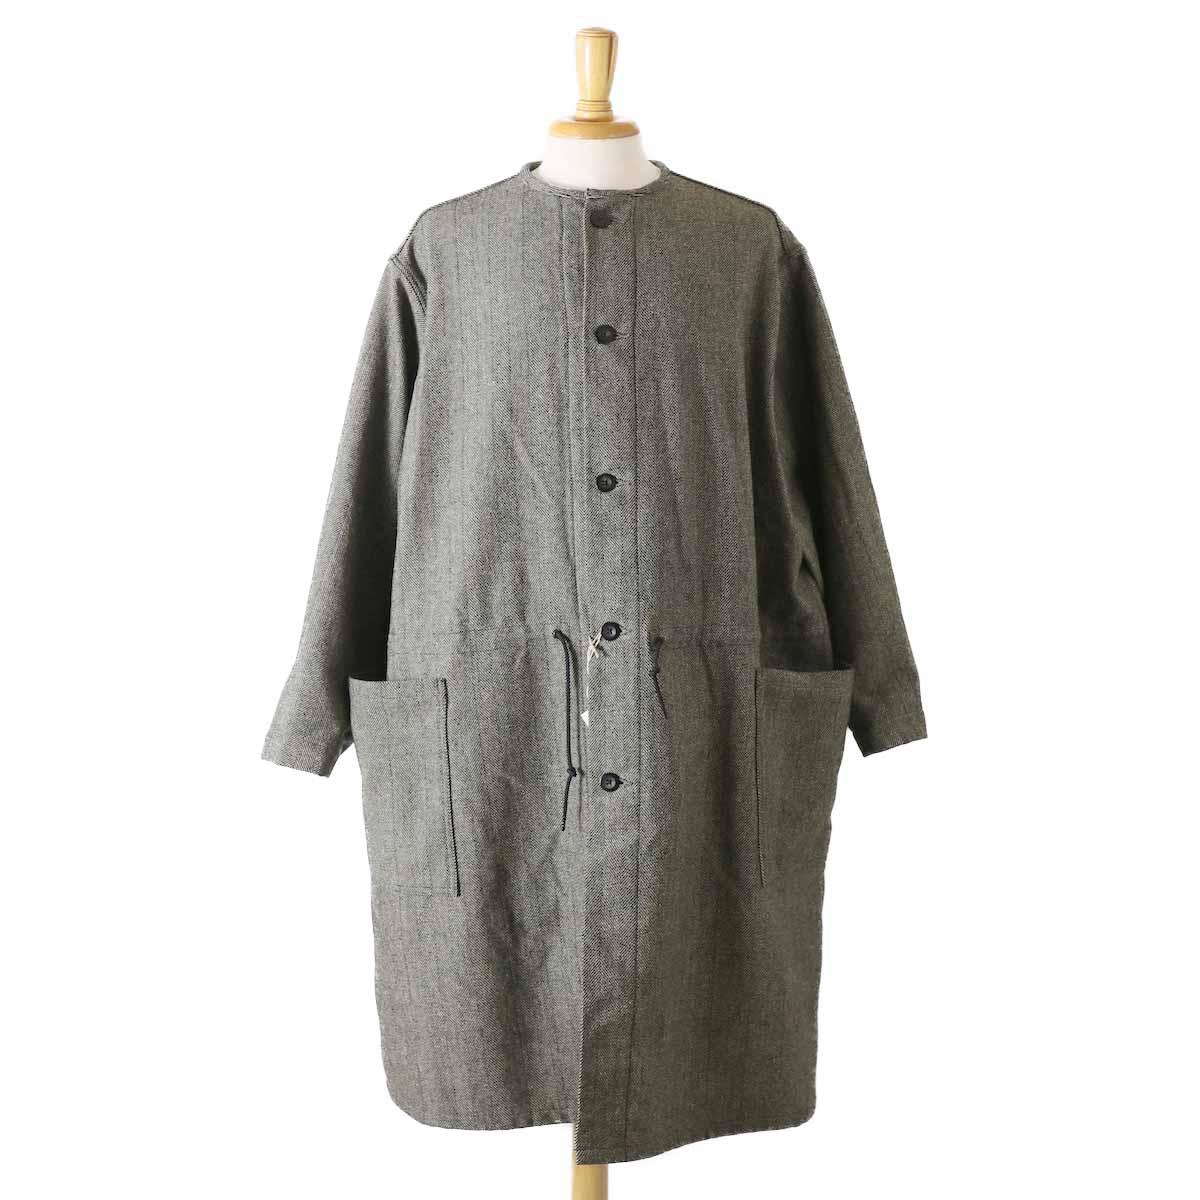 orSlow / Cotton Shell No Collar Coat -Melton Wool Herringbone Twill(GRAY)